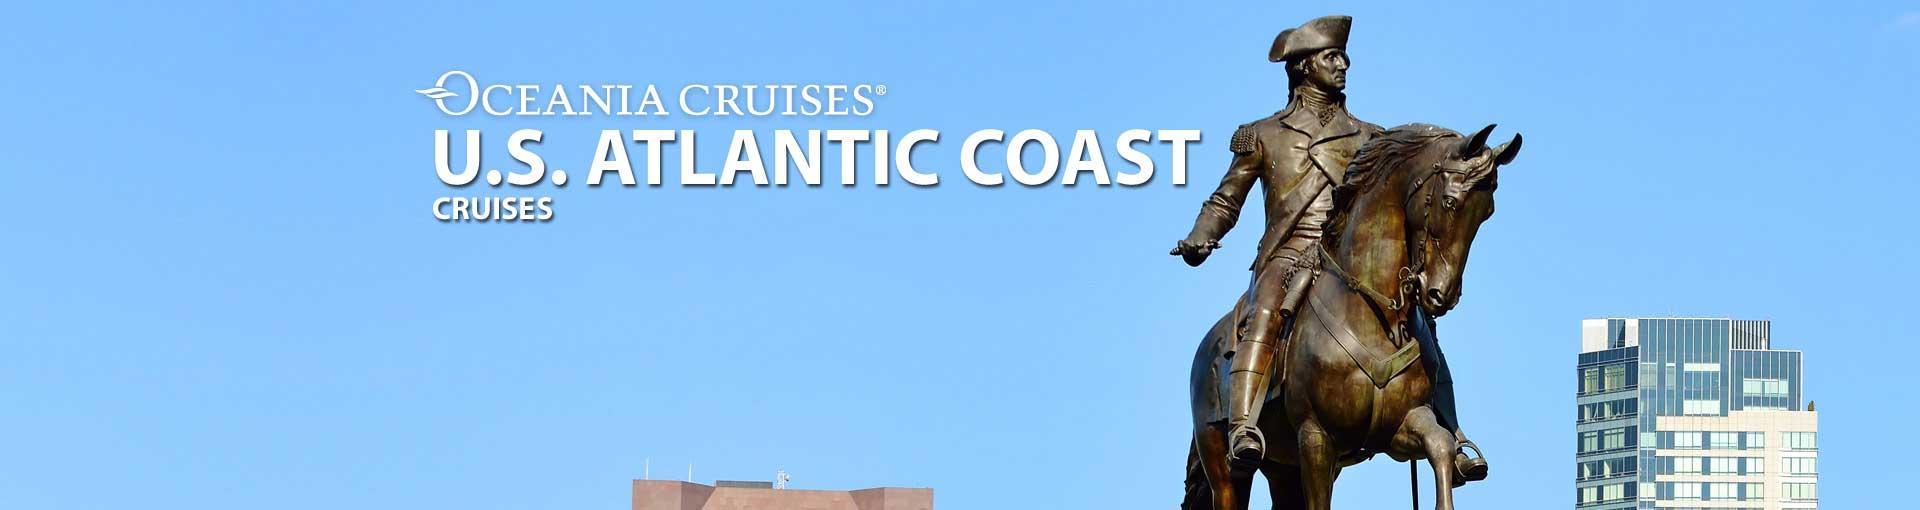 Oceania Cruises US Atlantic Coast Cruises